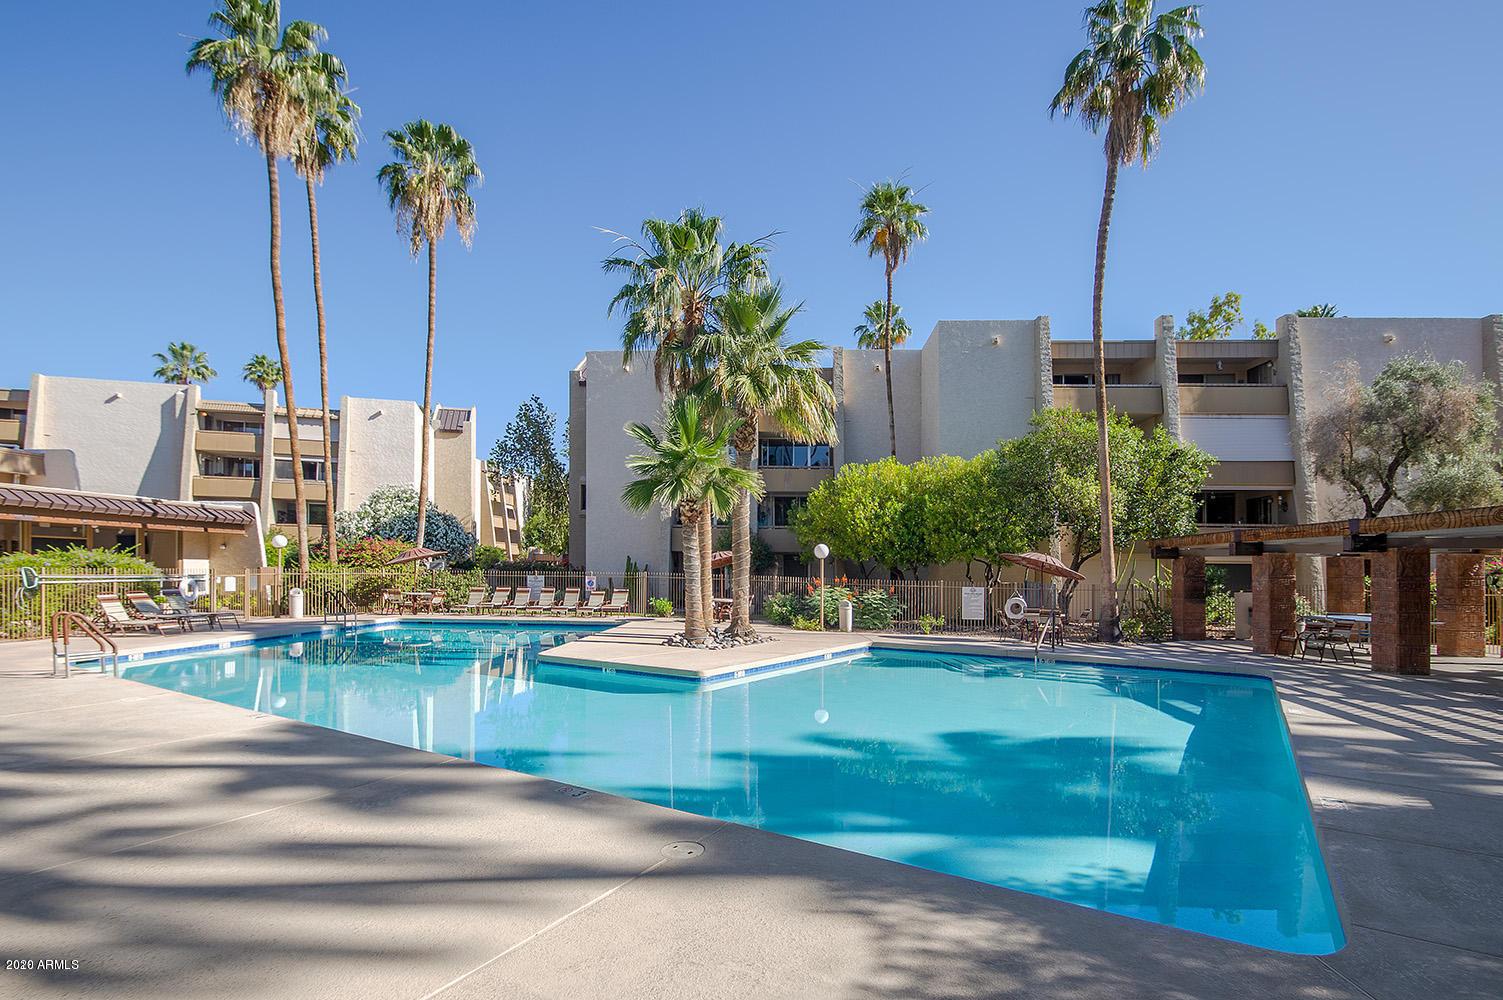 Scottsdale AZ 85251 Photo 21